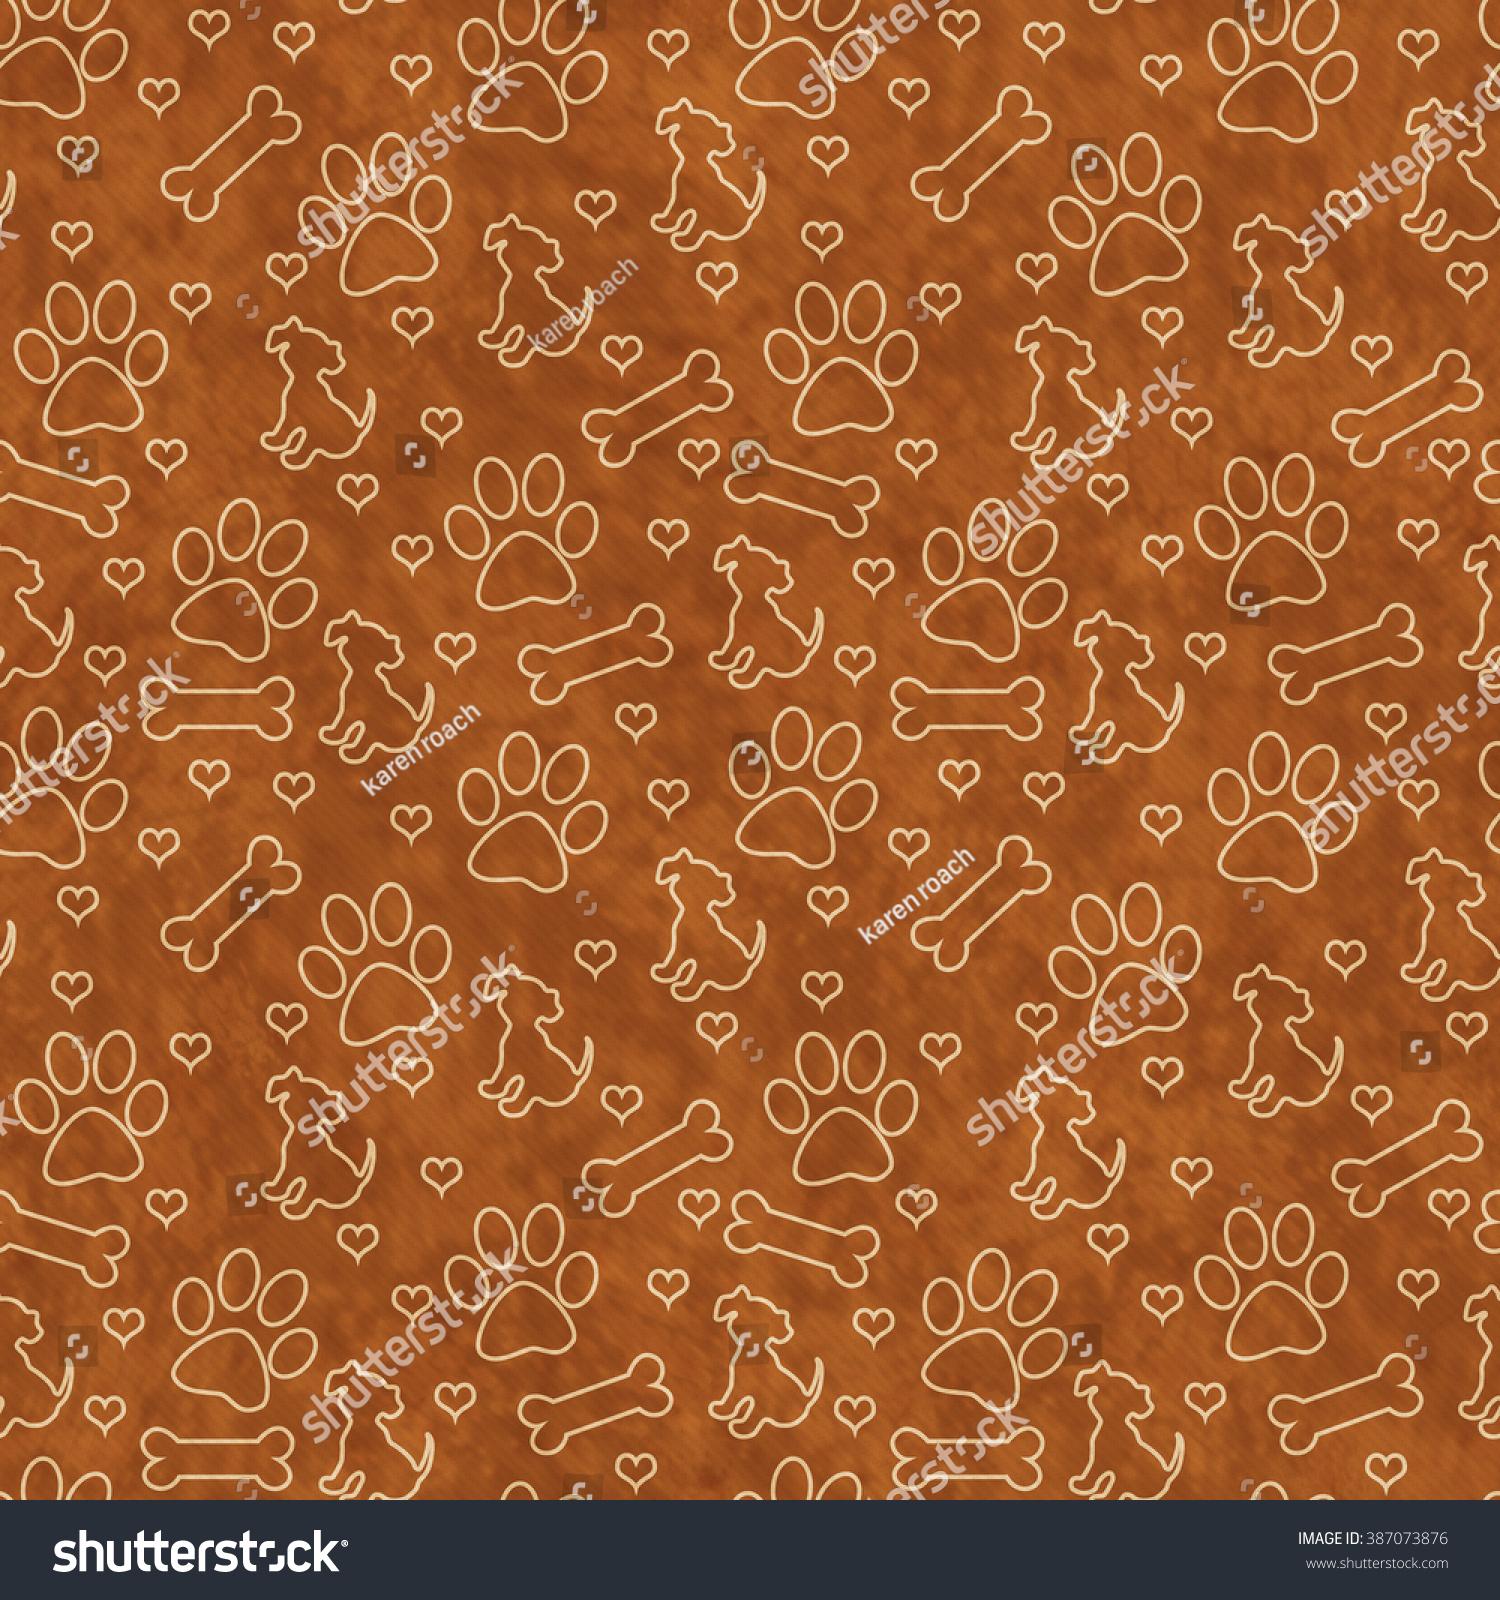 Brown dog bone background - photo#35